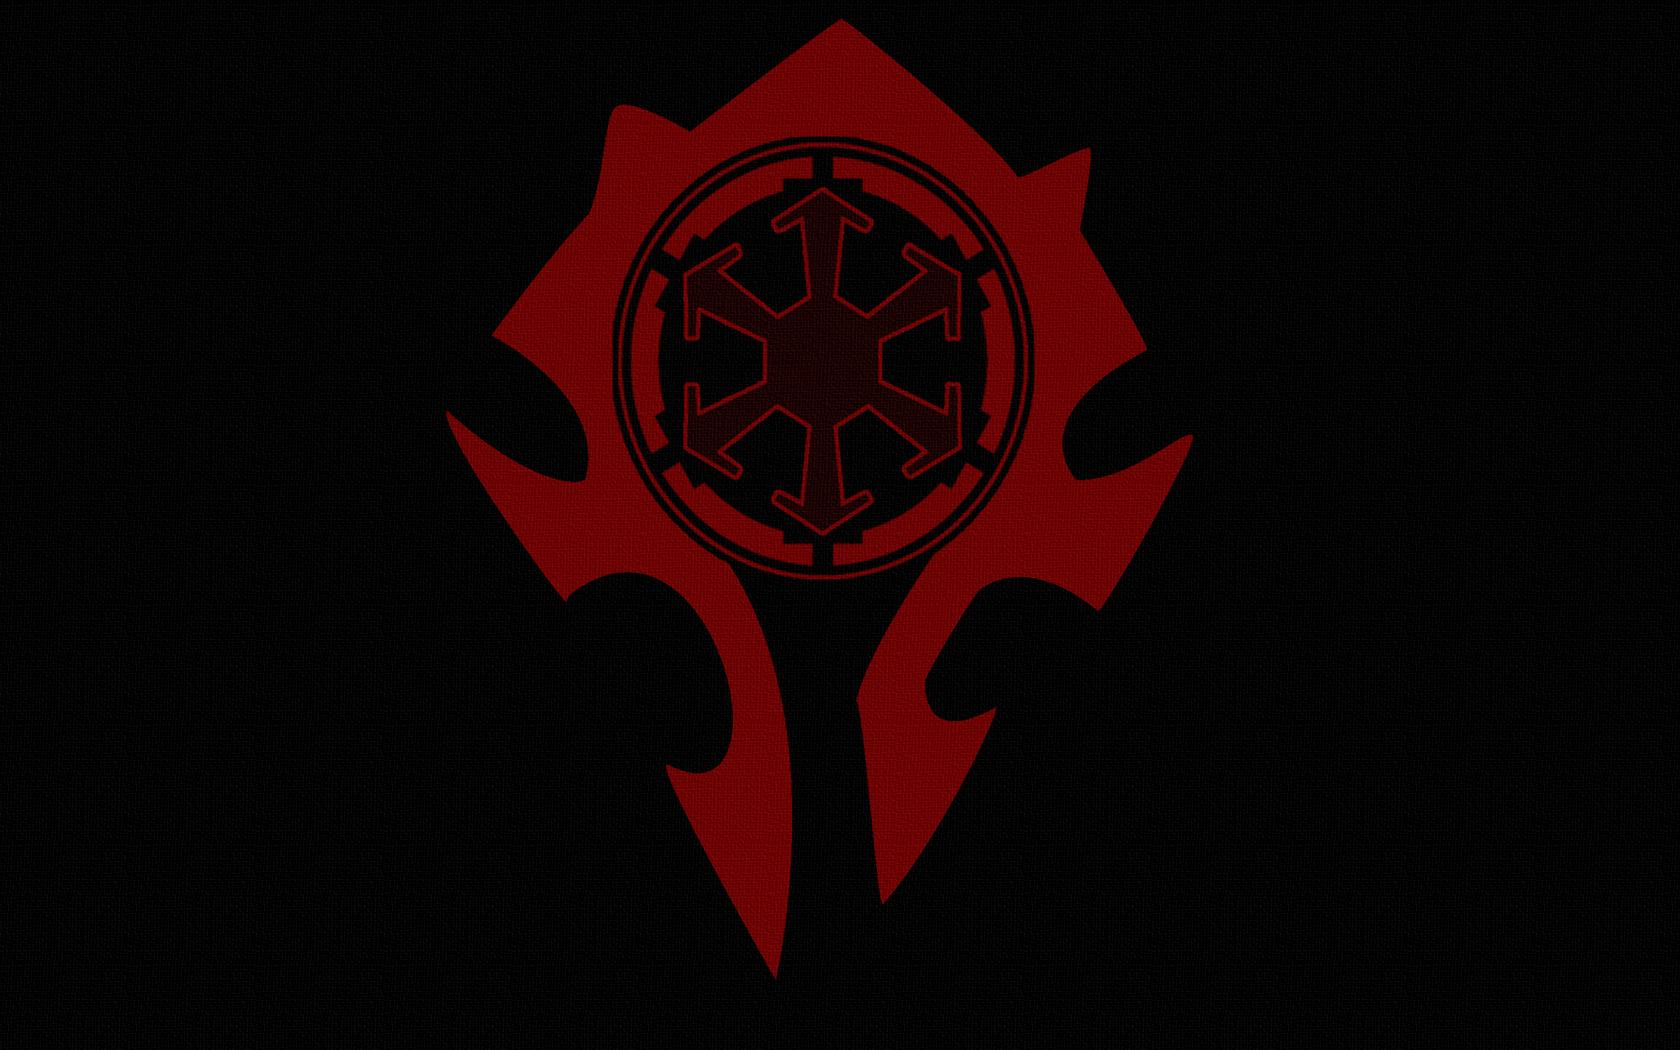 Image Sith Horde 1 Star Wars World Of Warcraft Wallp By Jaxxtraxx